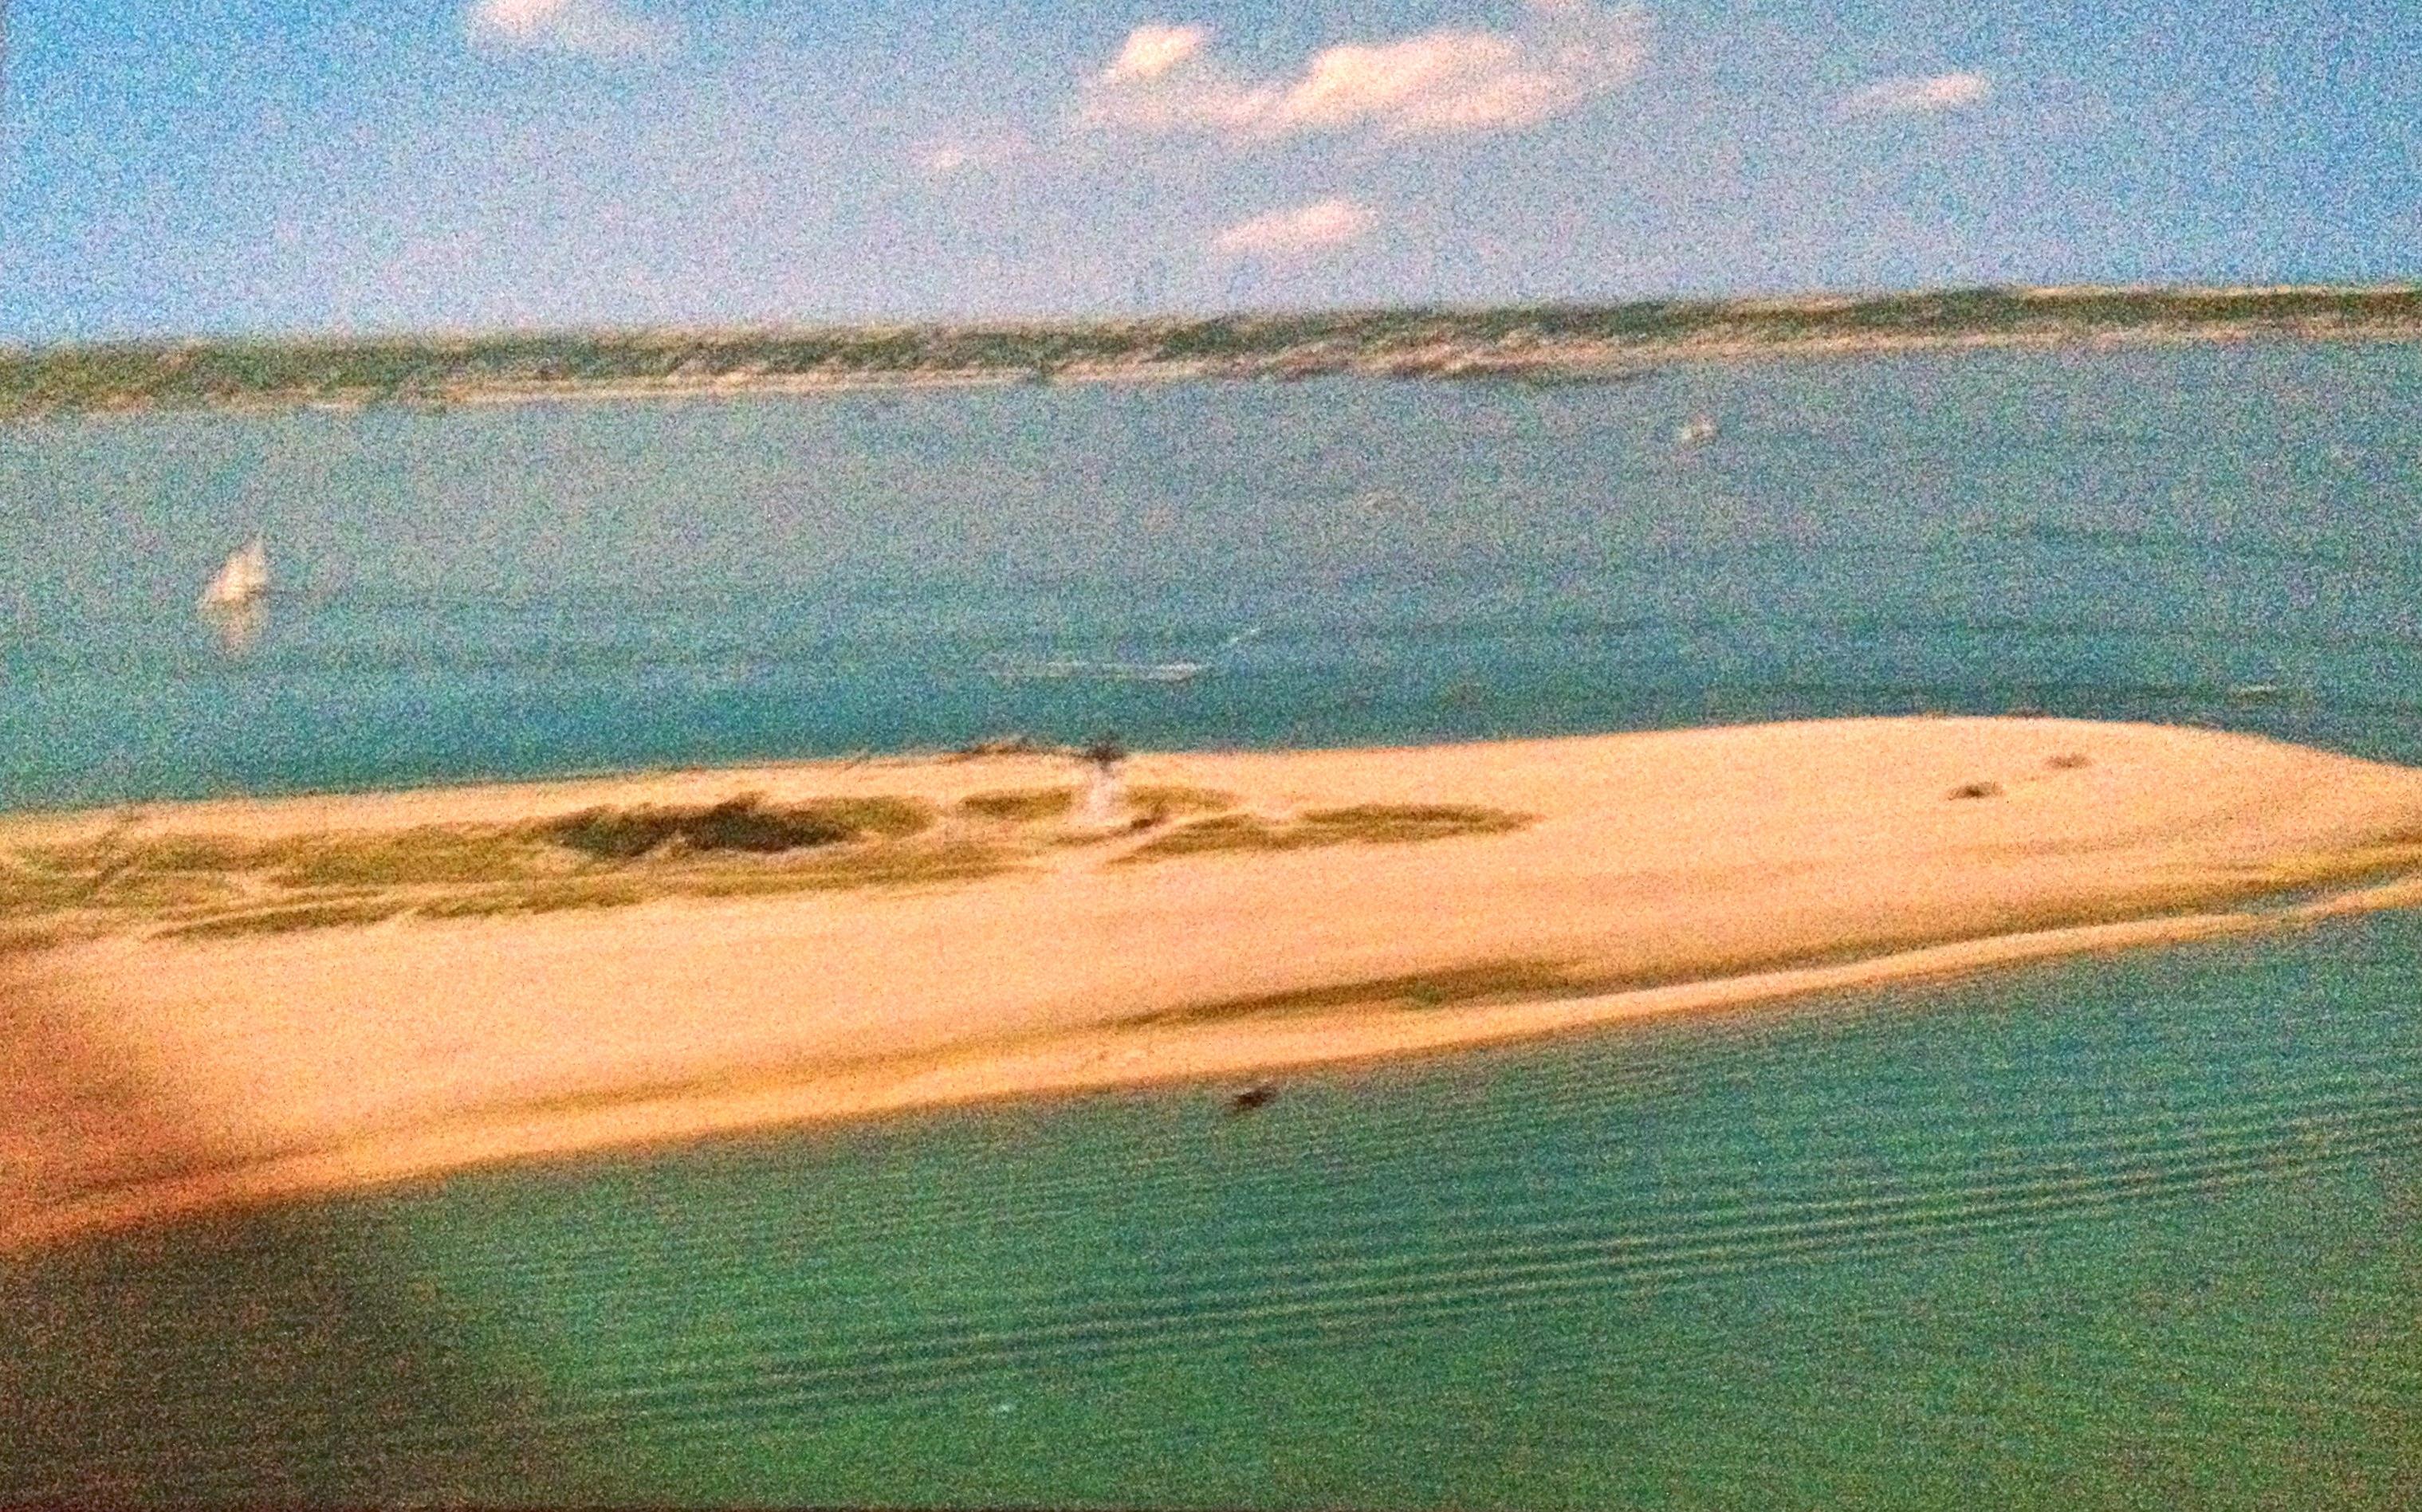 Cape cod nude beach right! seems